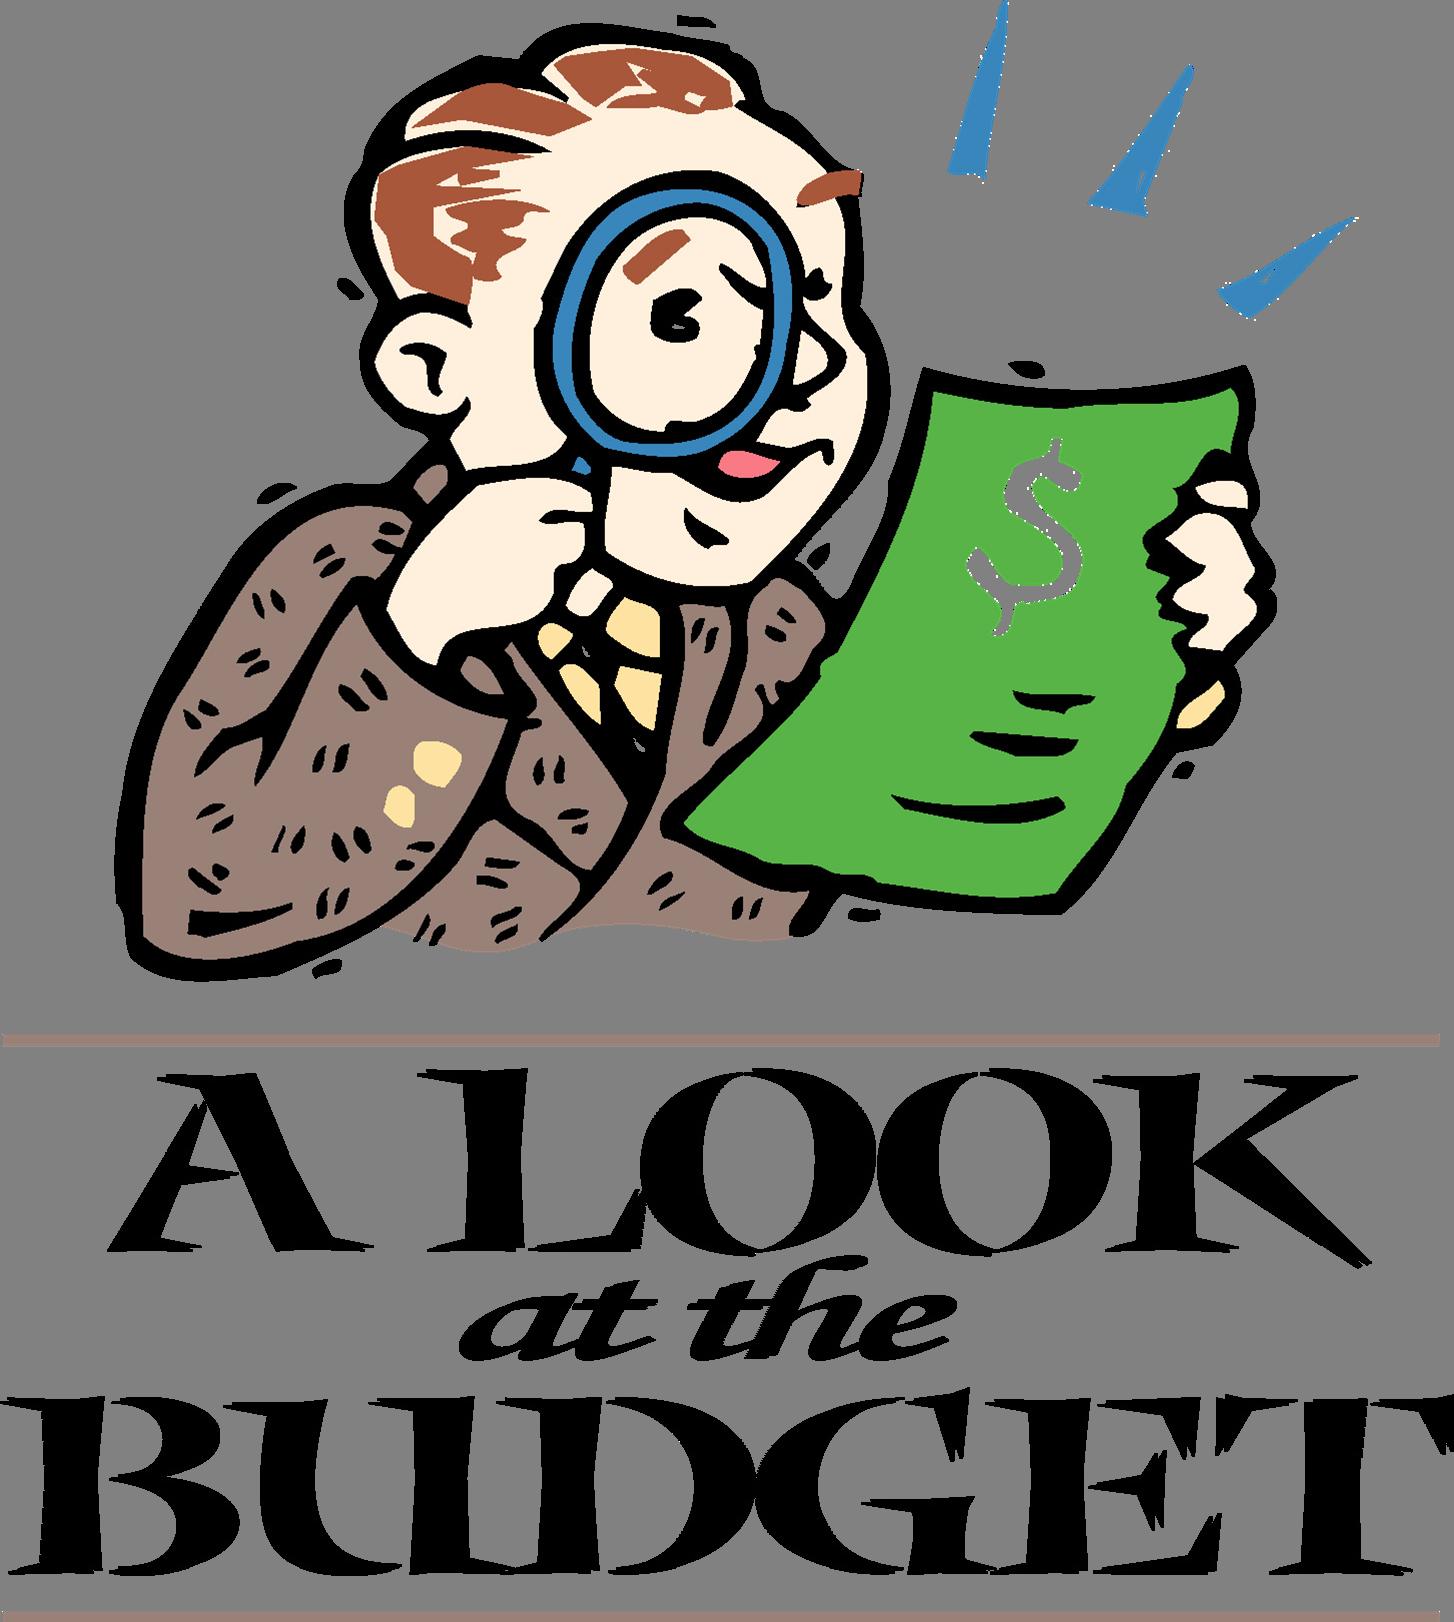 Tax personal income